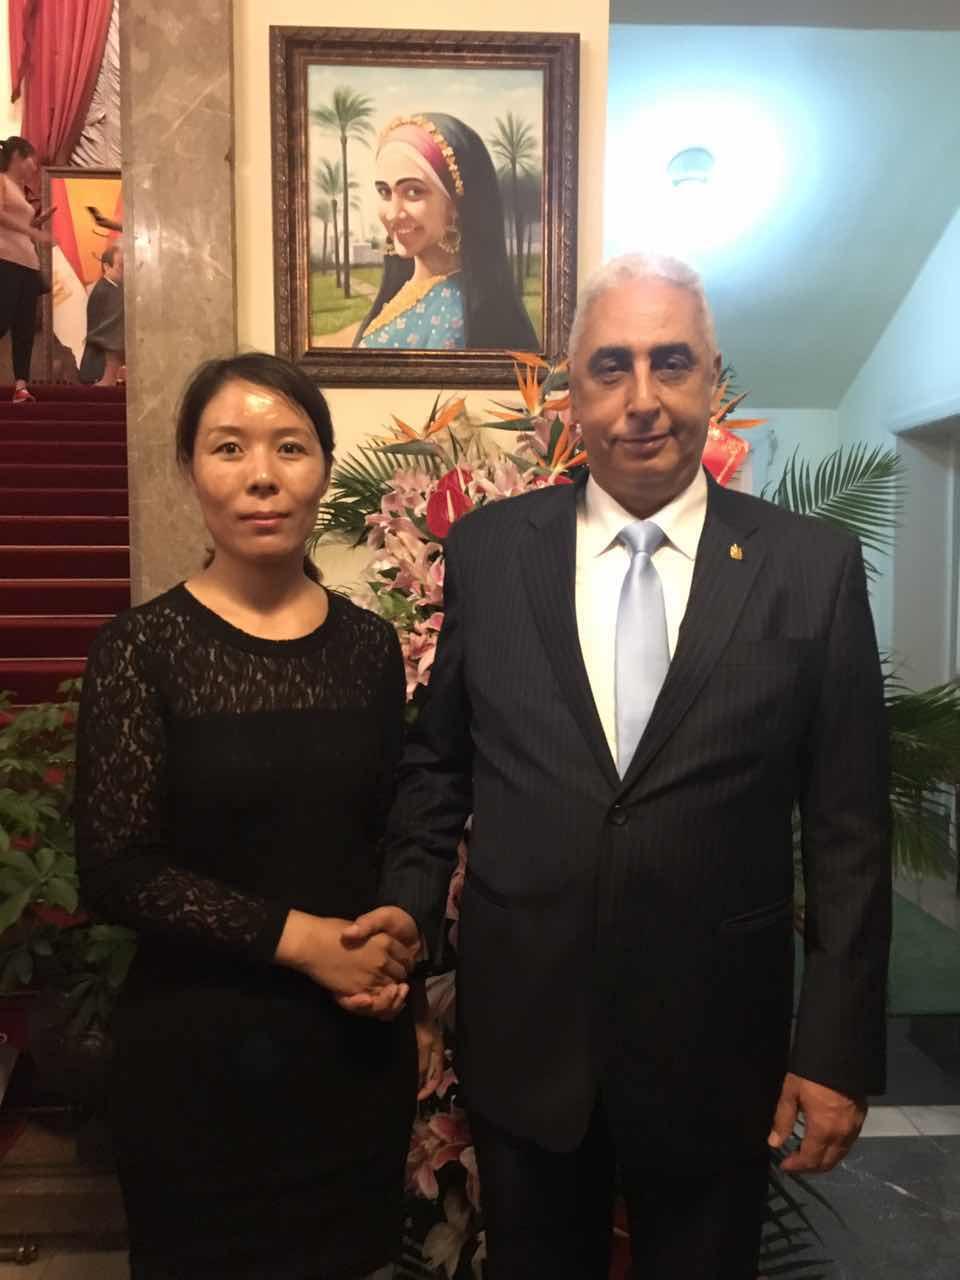 Secretary General Cui Jianghong and Egyptian Ambassador to China H.E. Mr. Mohamed Osama Taha Elmajdoub